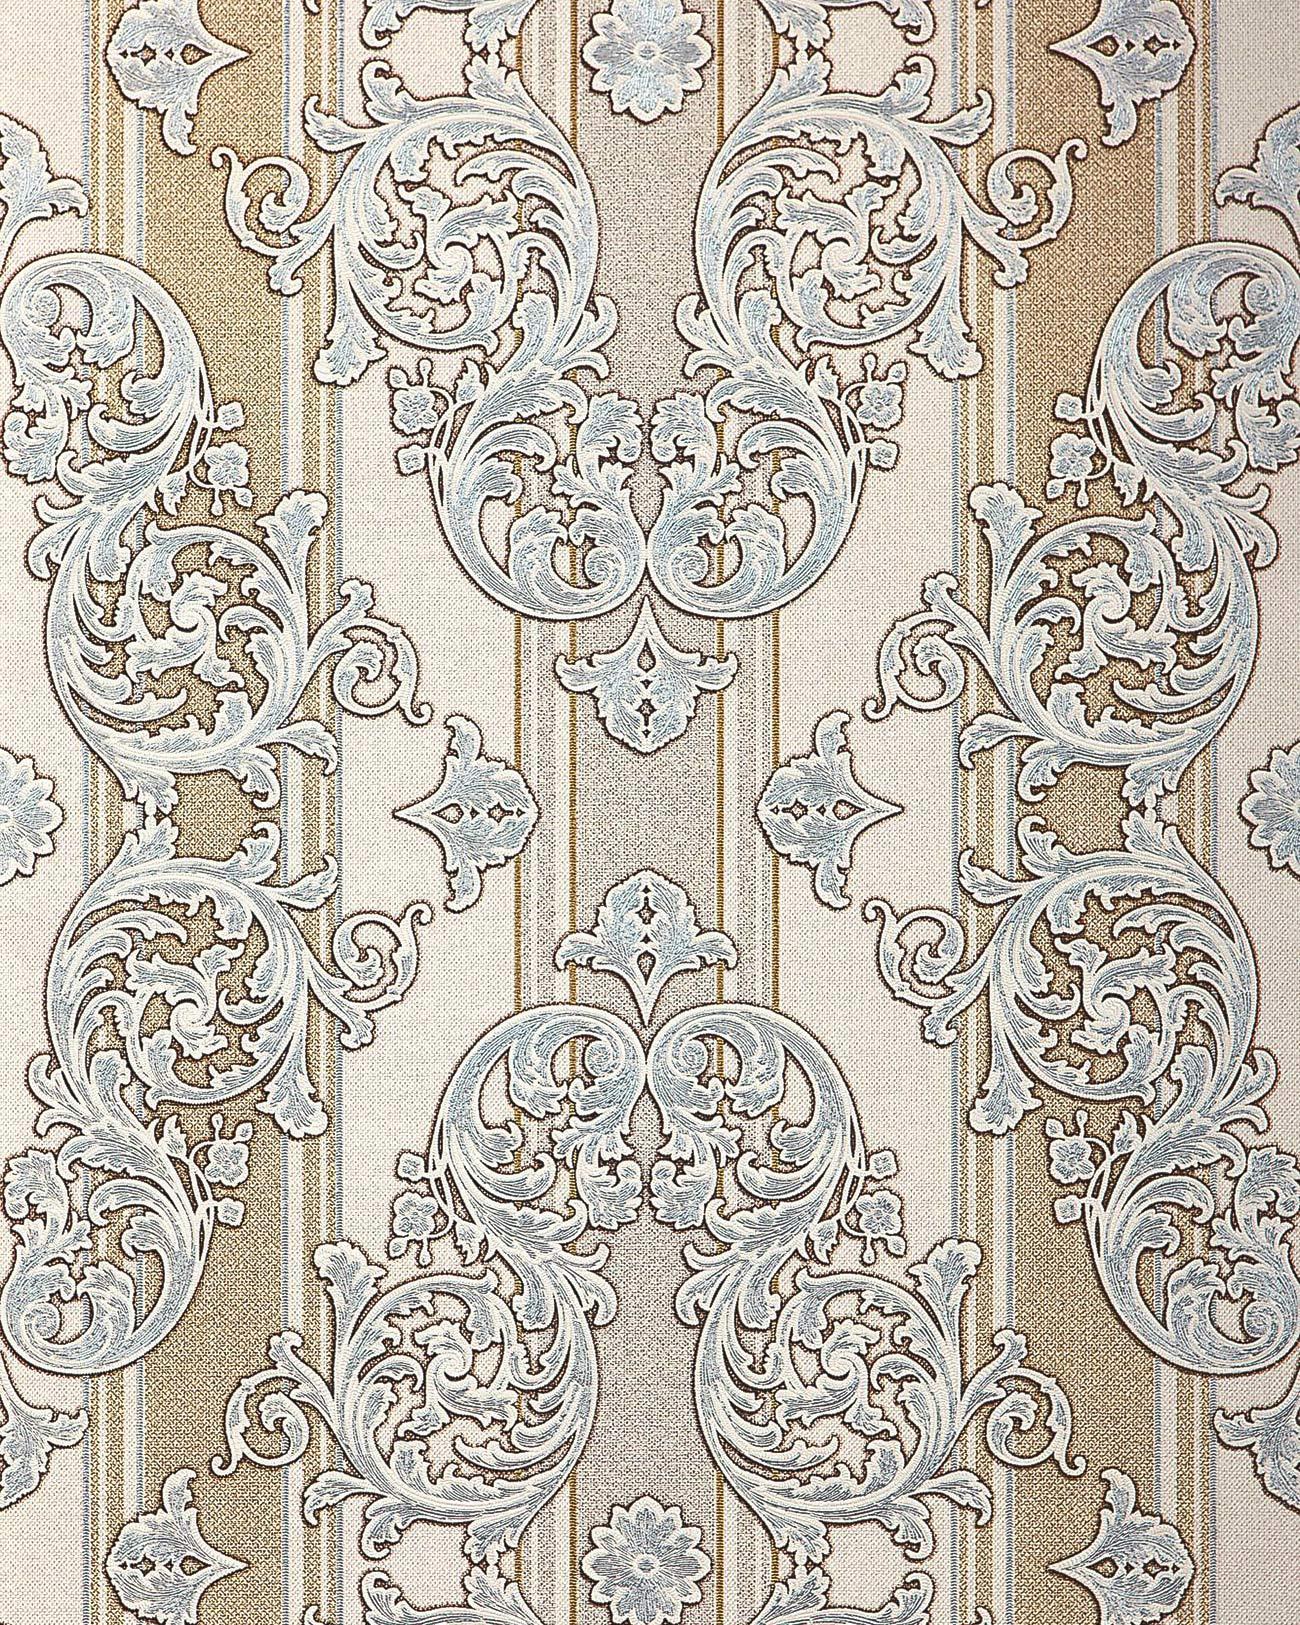 barock tapete edem 580 30 hochwertige gepr gte tapete in textiloptik und metallic effekt hell. Black Bedroom Furniture Sets. Home Design Ideas